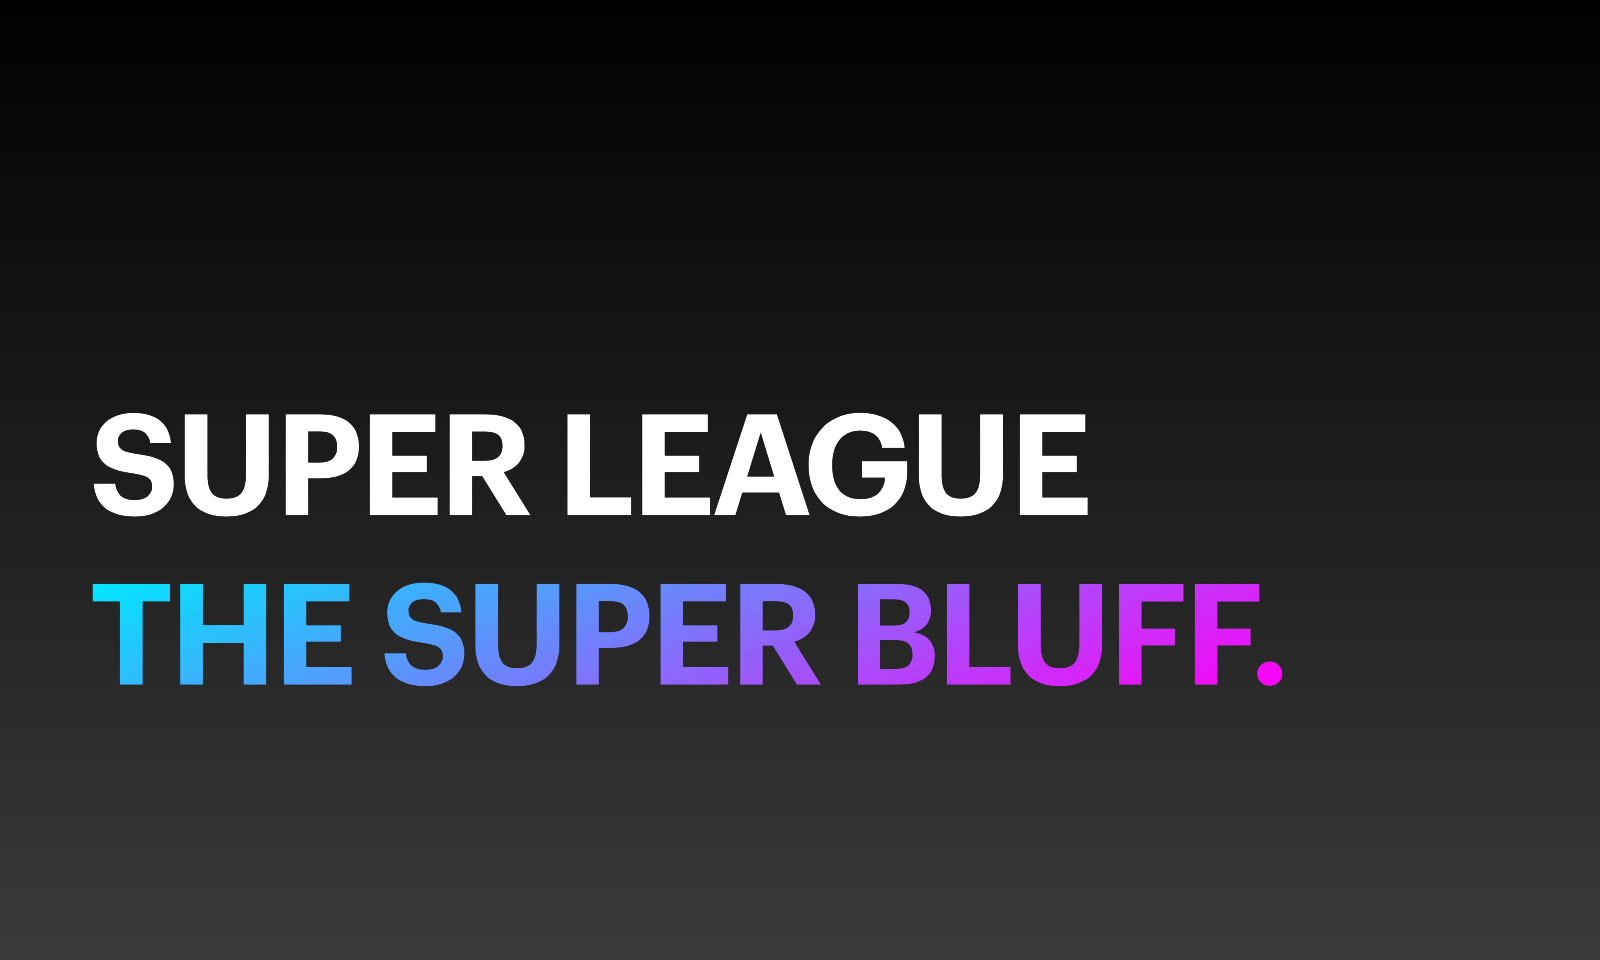 Ecco perché la Super Lega è fallita: per super incompetenza